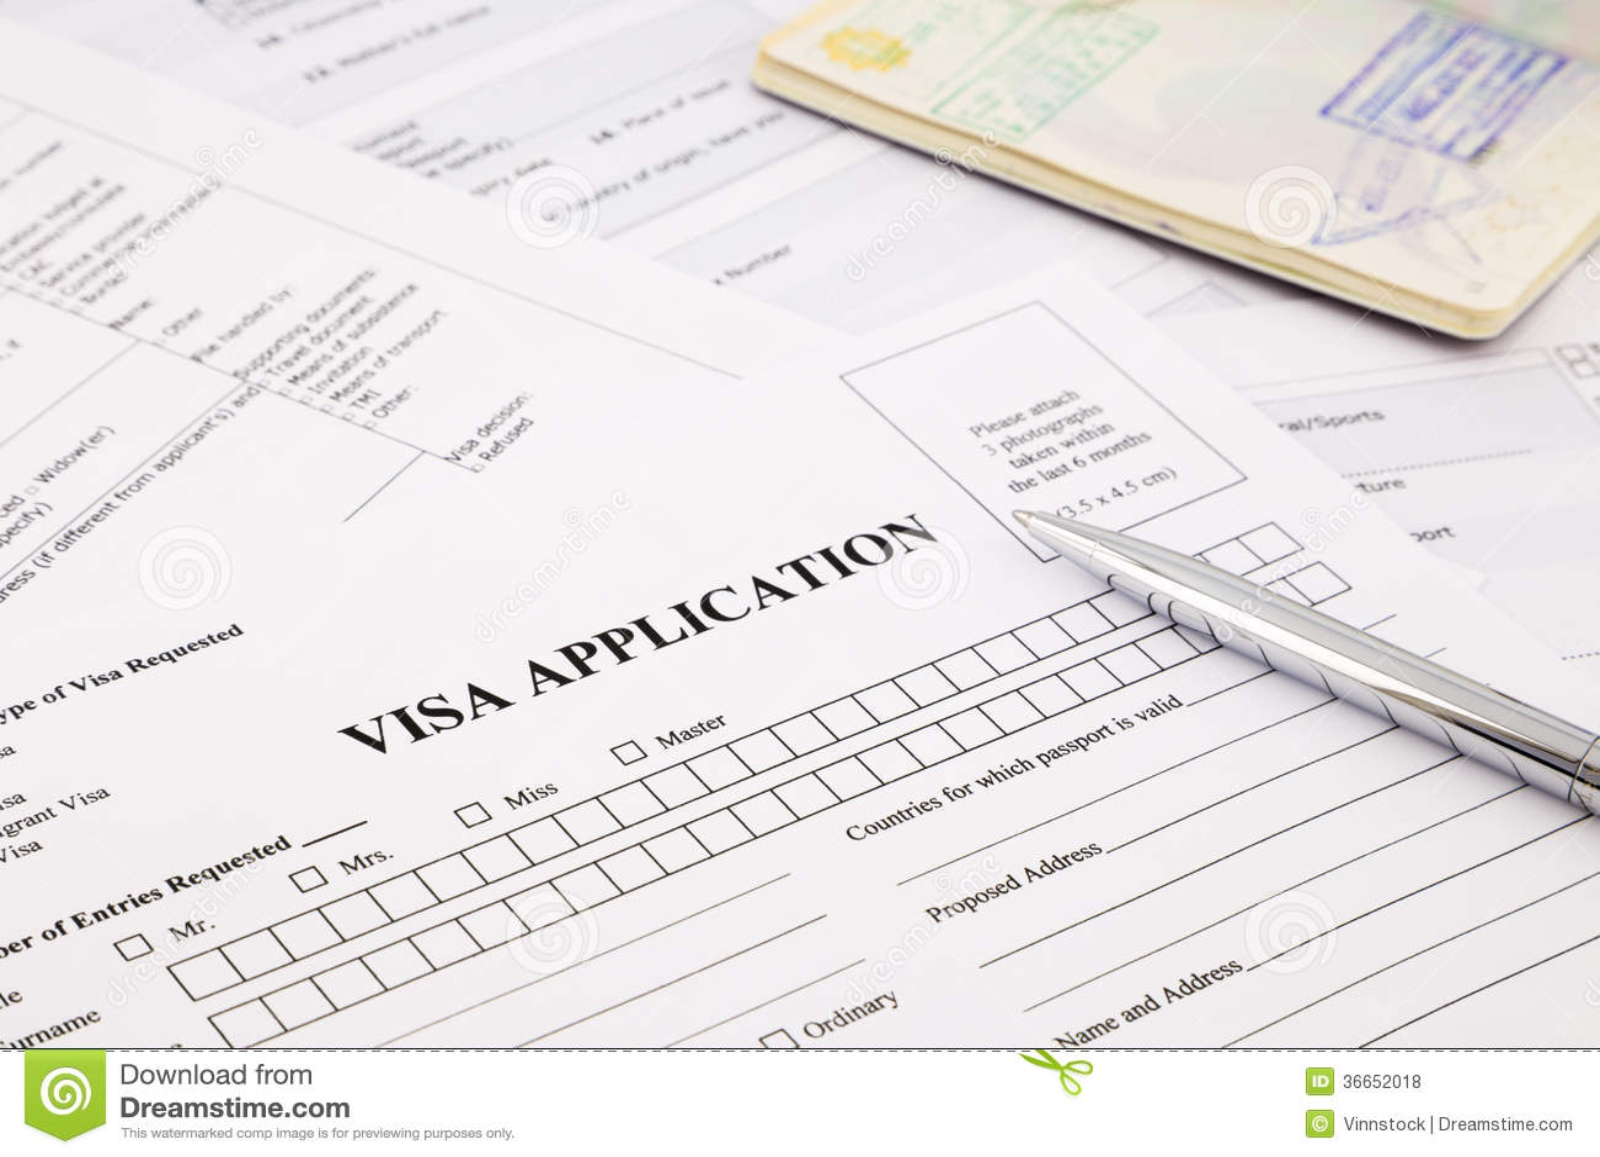 Passport application form geminifm passport application form falaconquin